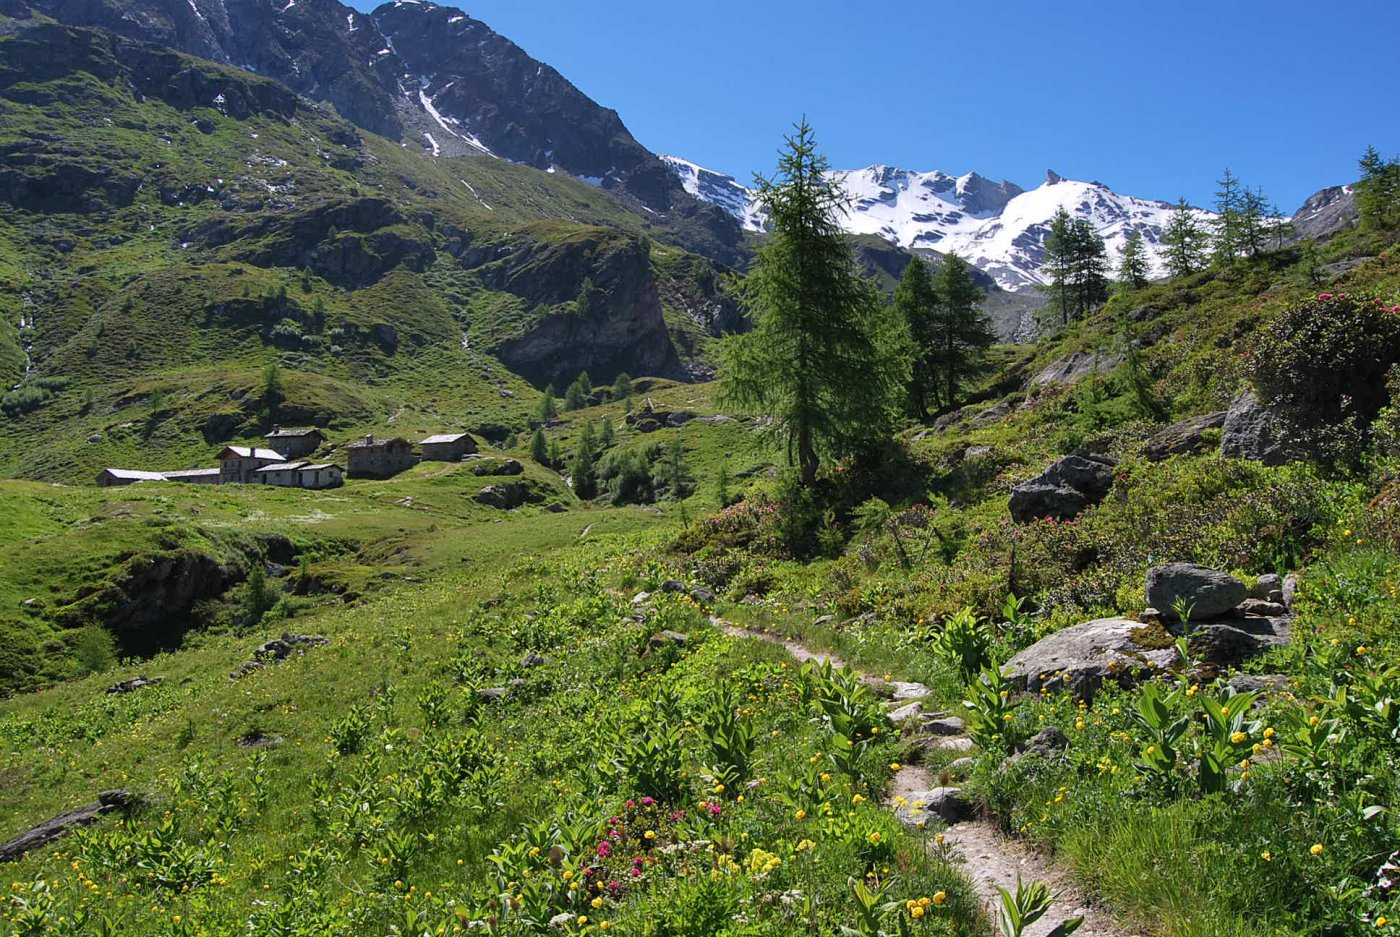 L'arrivo a Mont Fortchat, con la Gd Rousse sullo sfondo